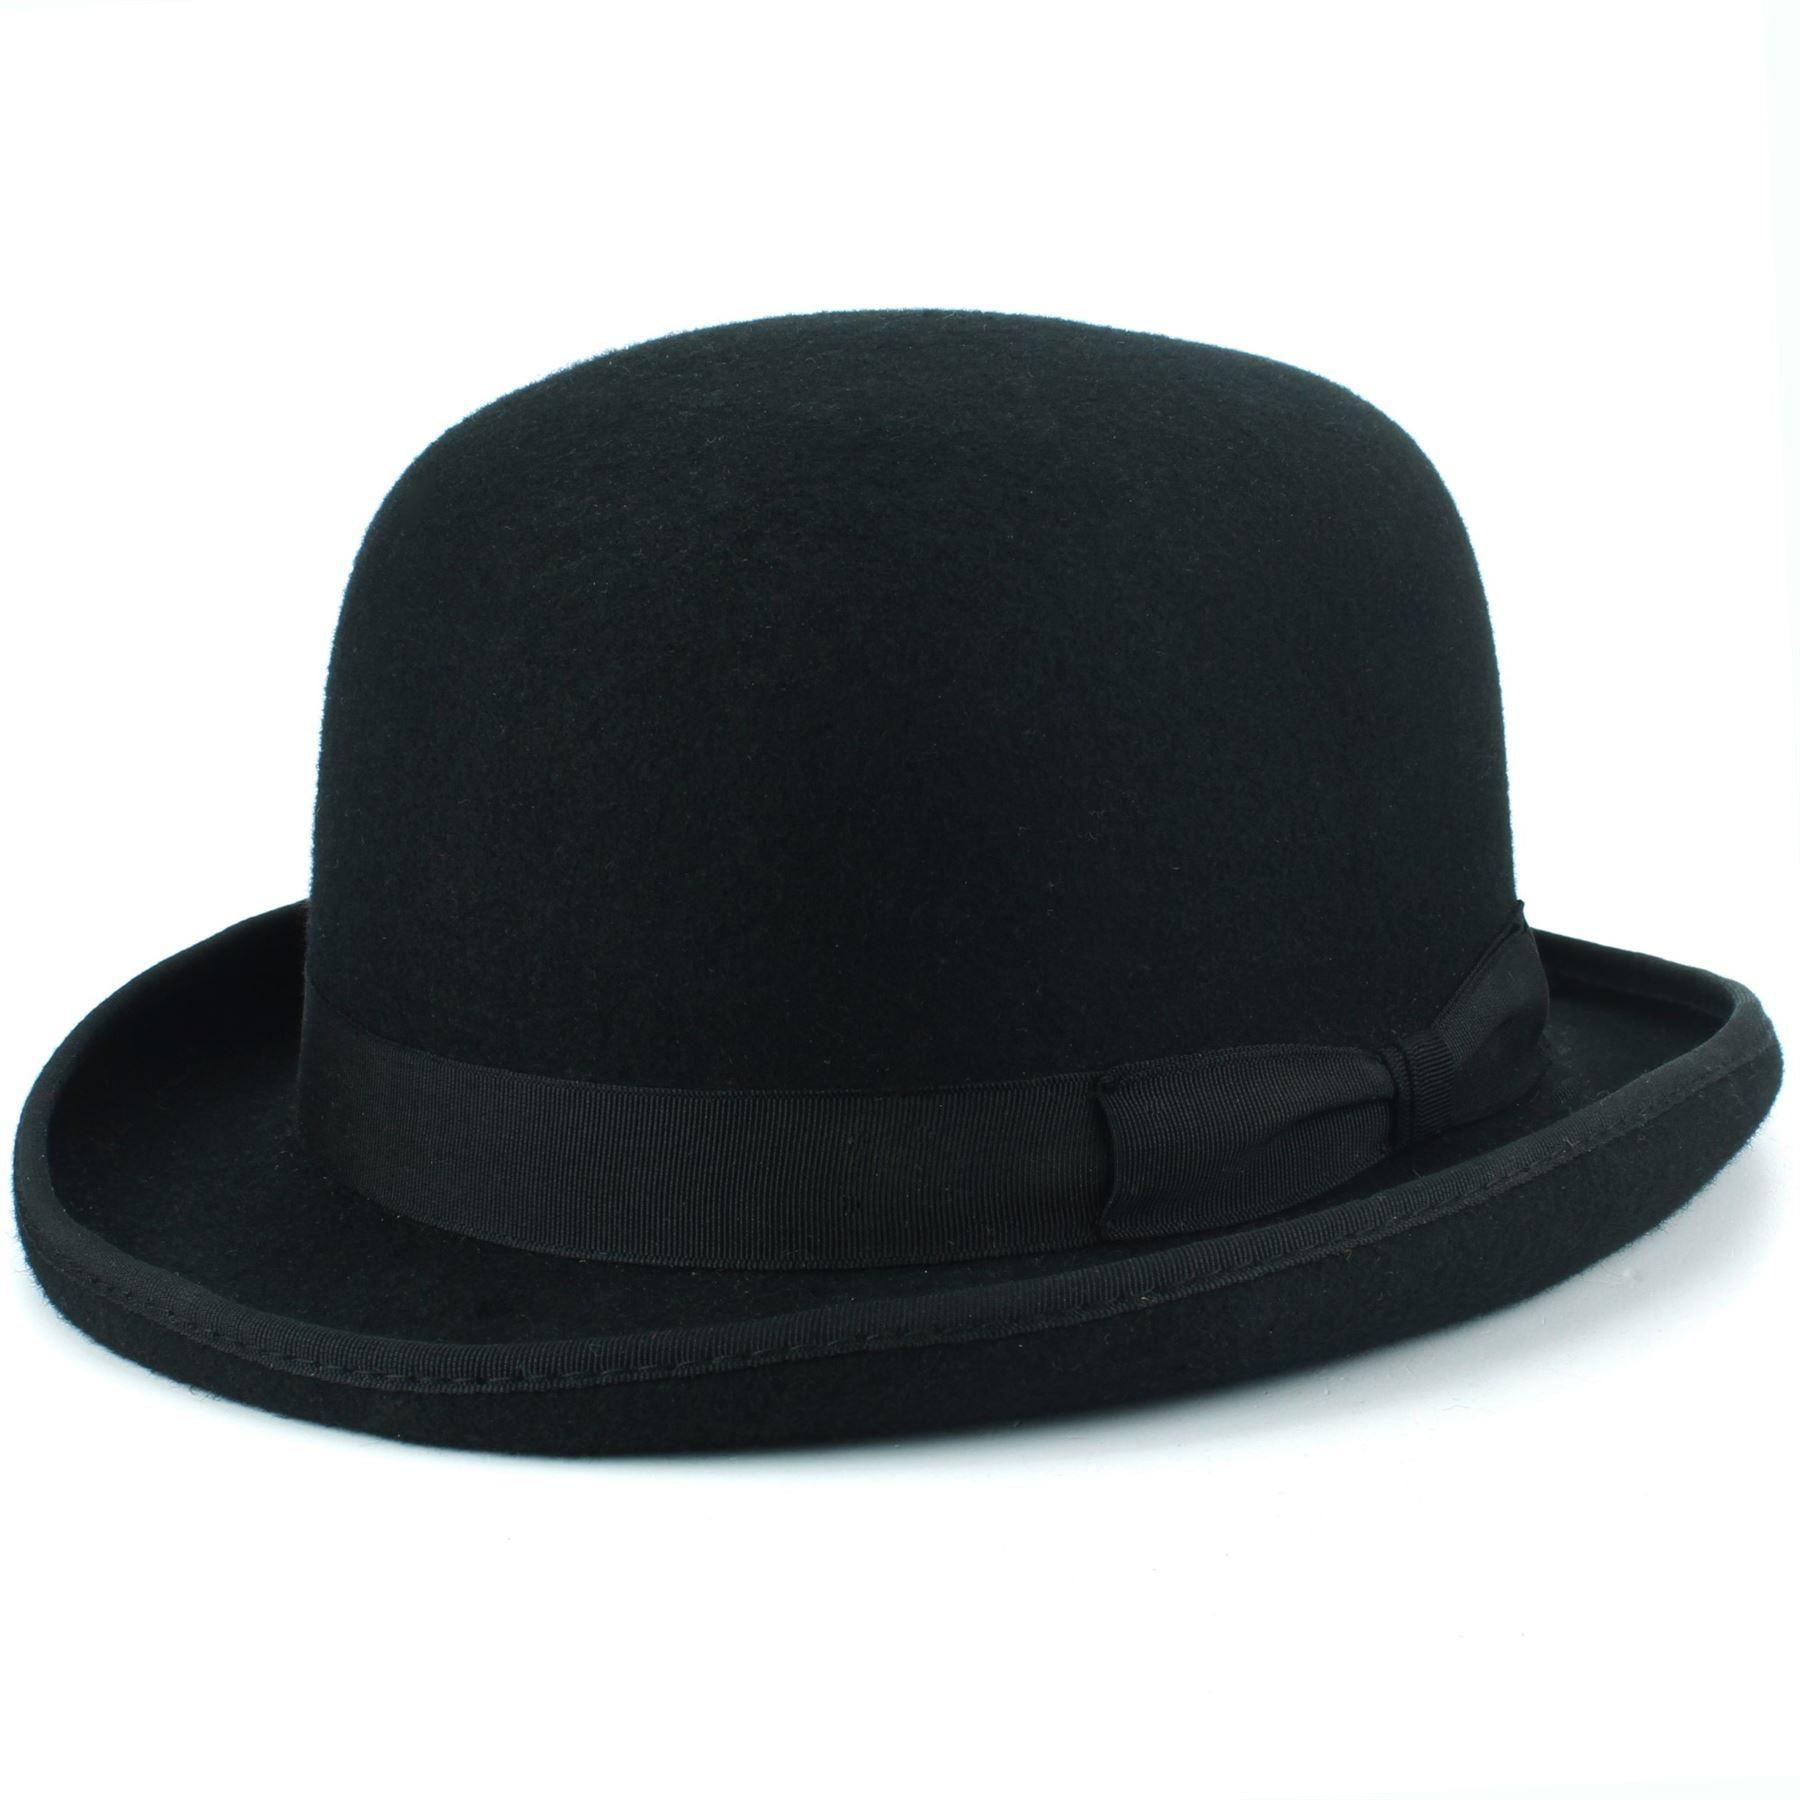 ba8784d9 Details about Wool Felt Bowler Hat Derby BLACK Hard Costume Hawkins Fedora  Men Women